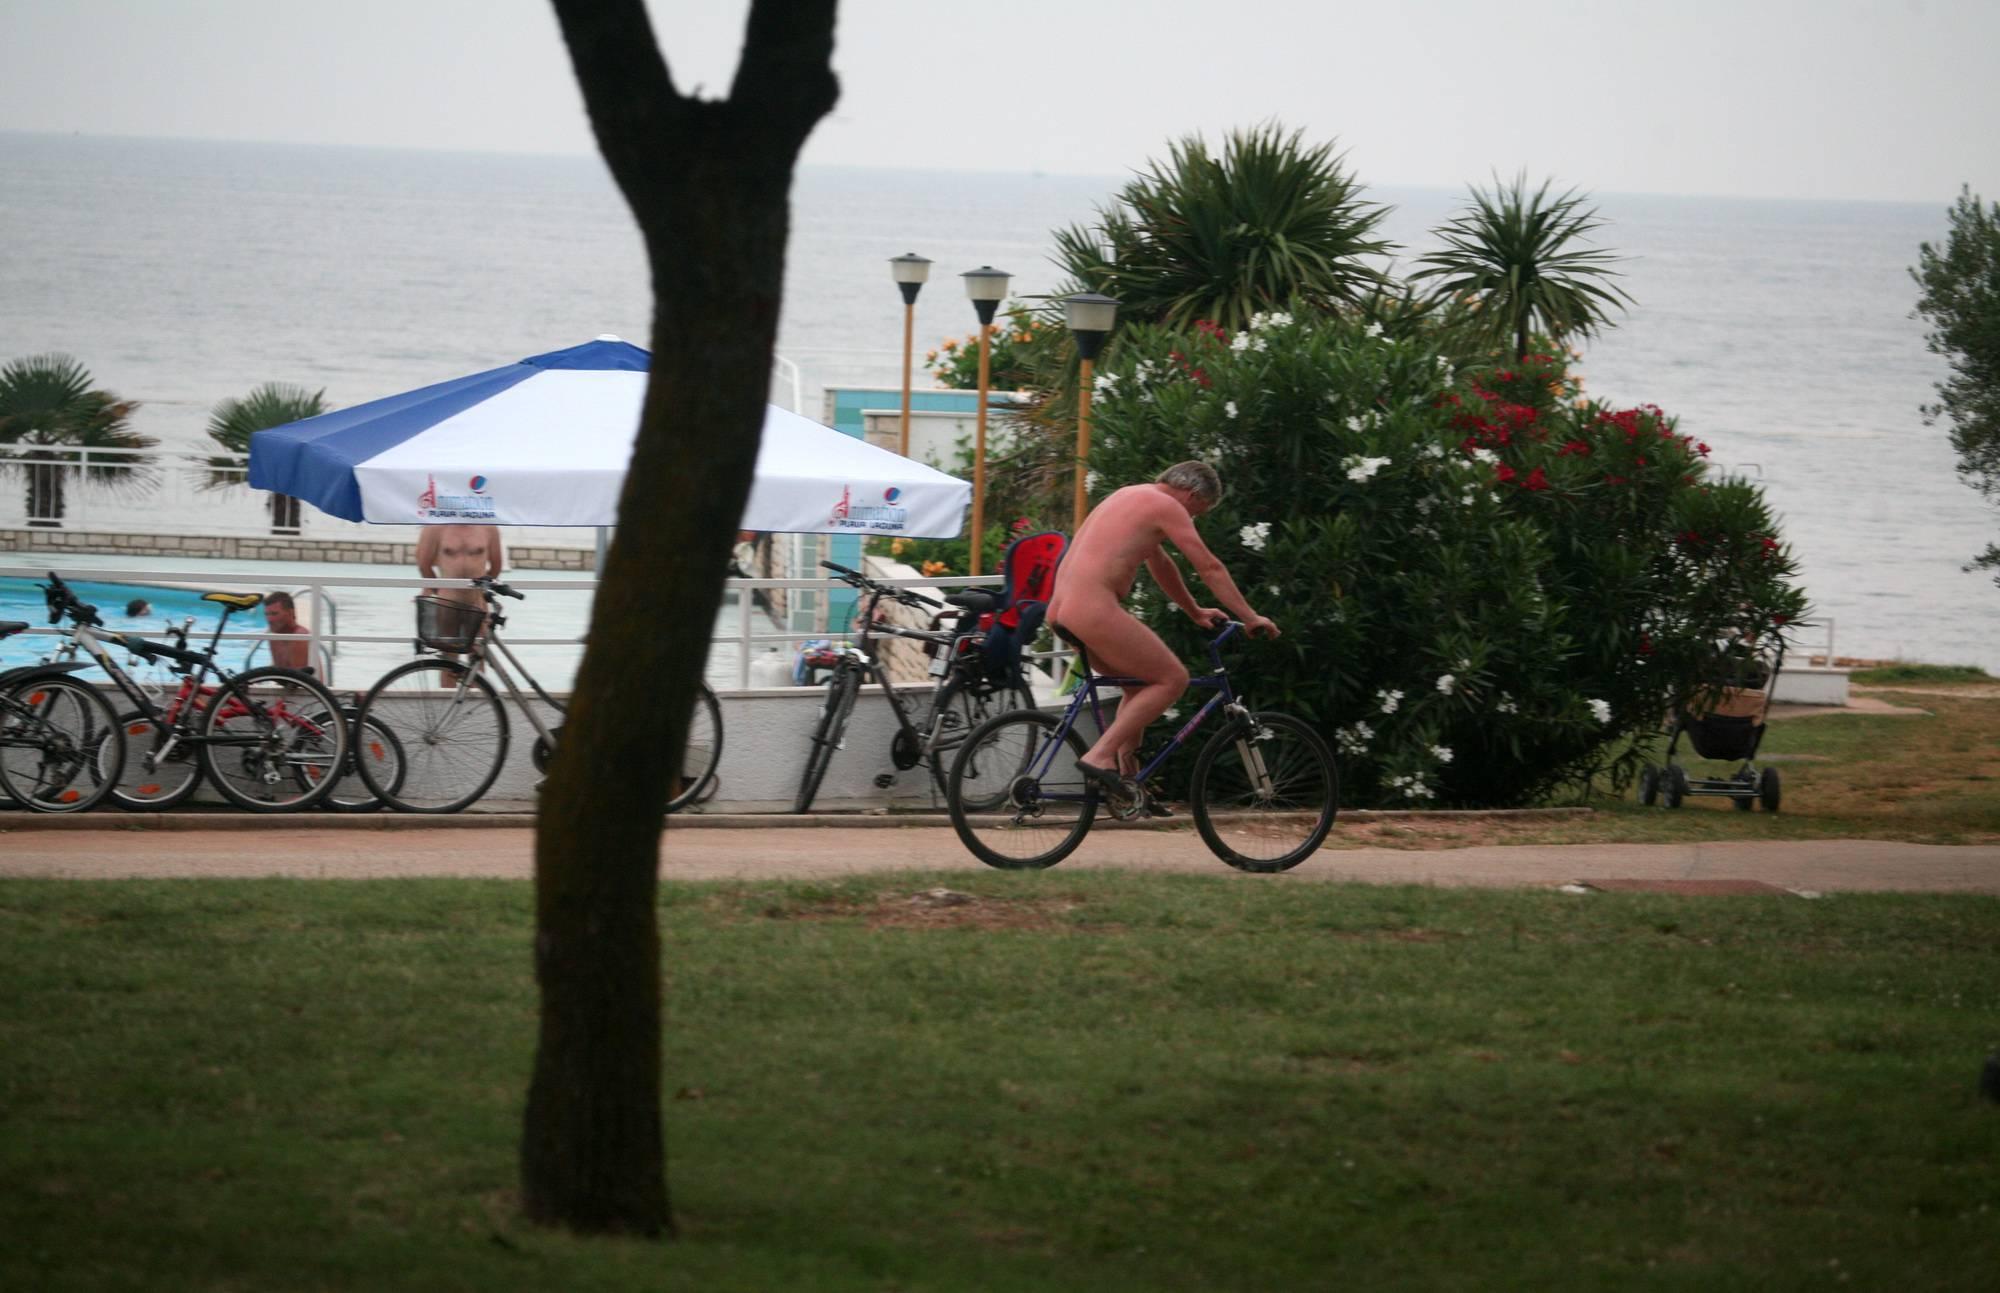 Naturist Poolside Biking - 2